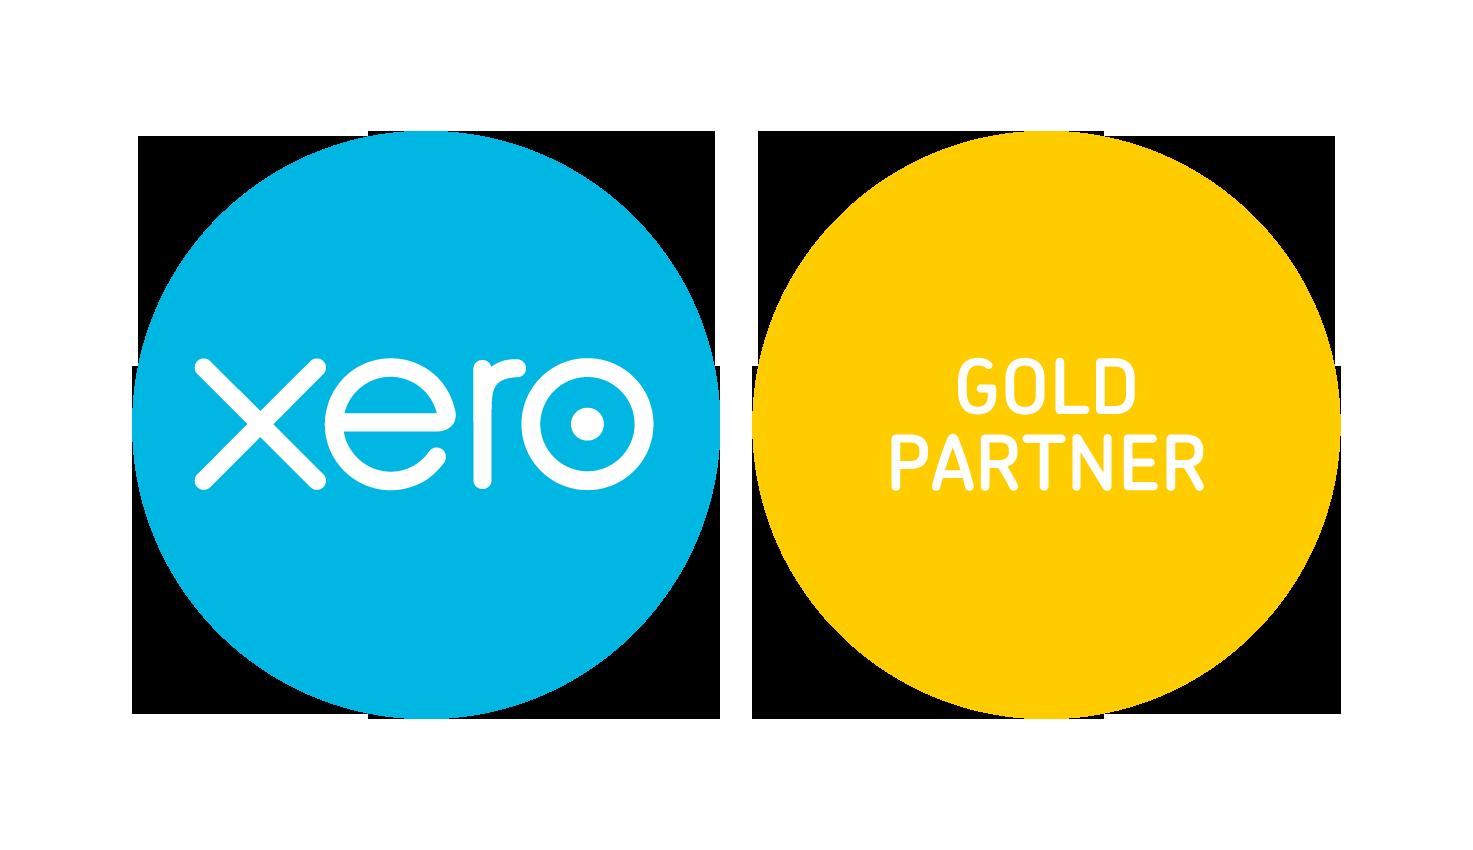 Xero Logo Illumin8